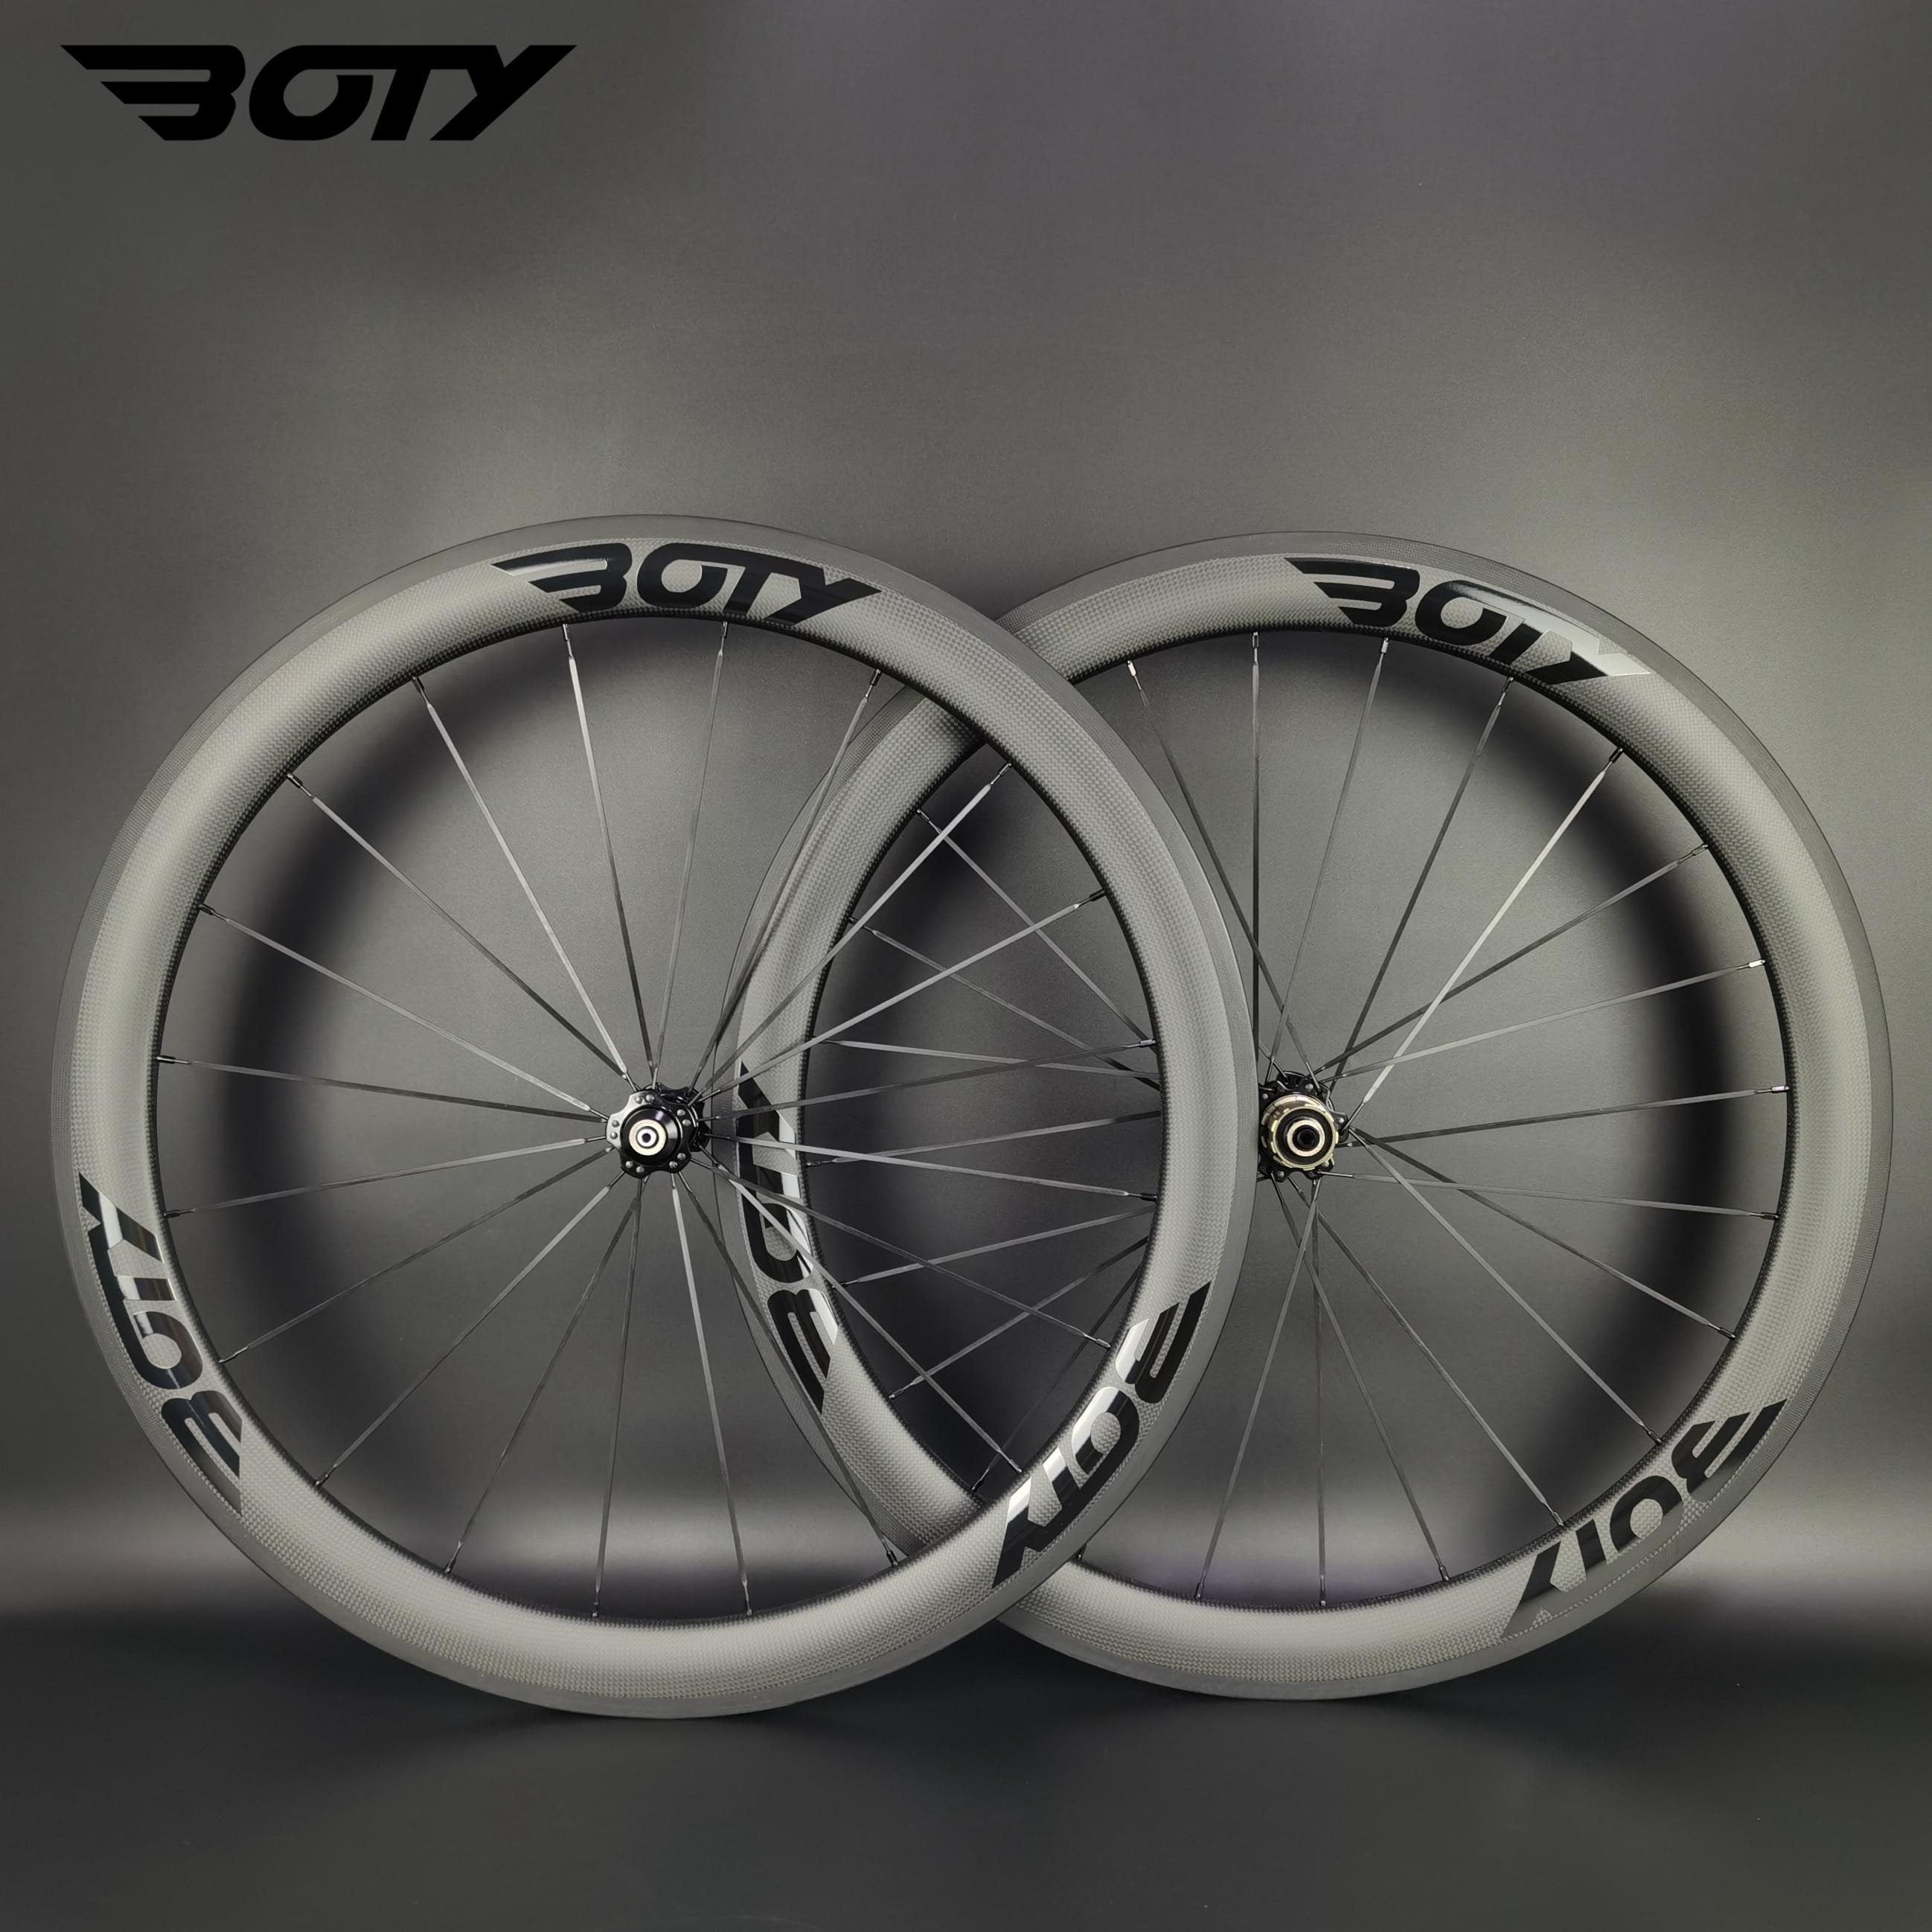 BOTY 700C الطريق دراجة ضوء عجلات الكربون 50 مللي متر عمق 23/25 مللي متر عرض الفاصلة/لايحتاج/أنبوبي دراجة العجلات مع 3k ماتي النهاية